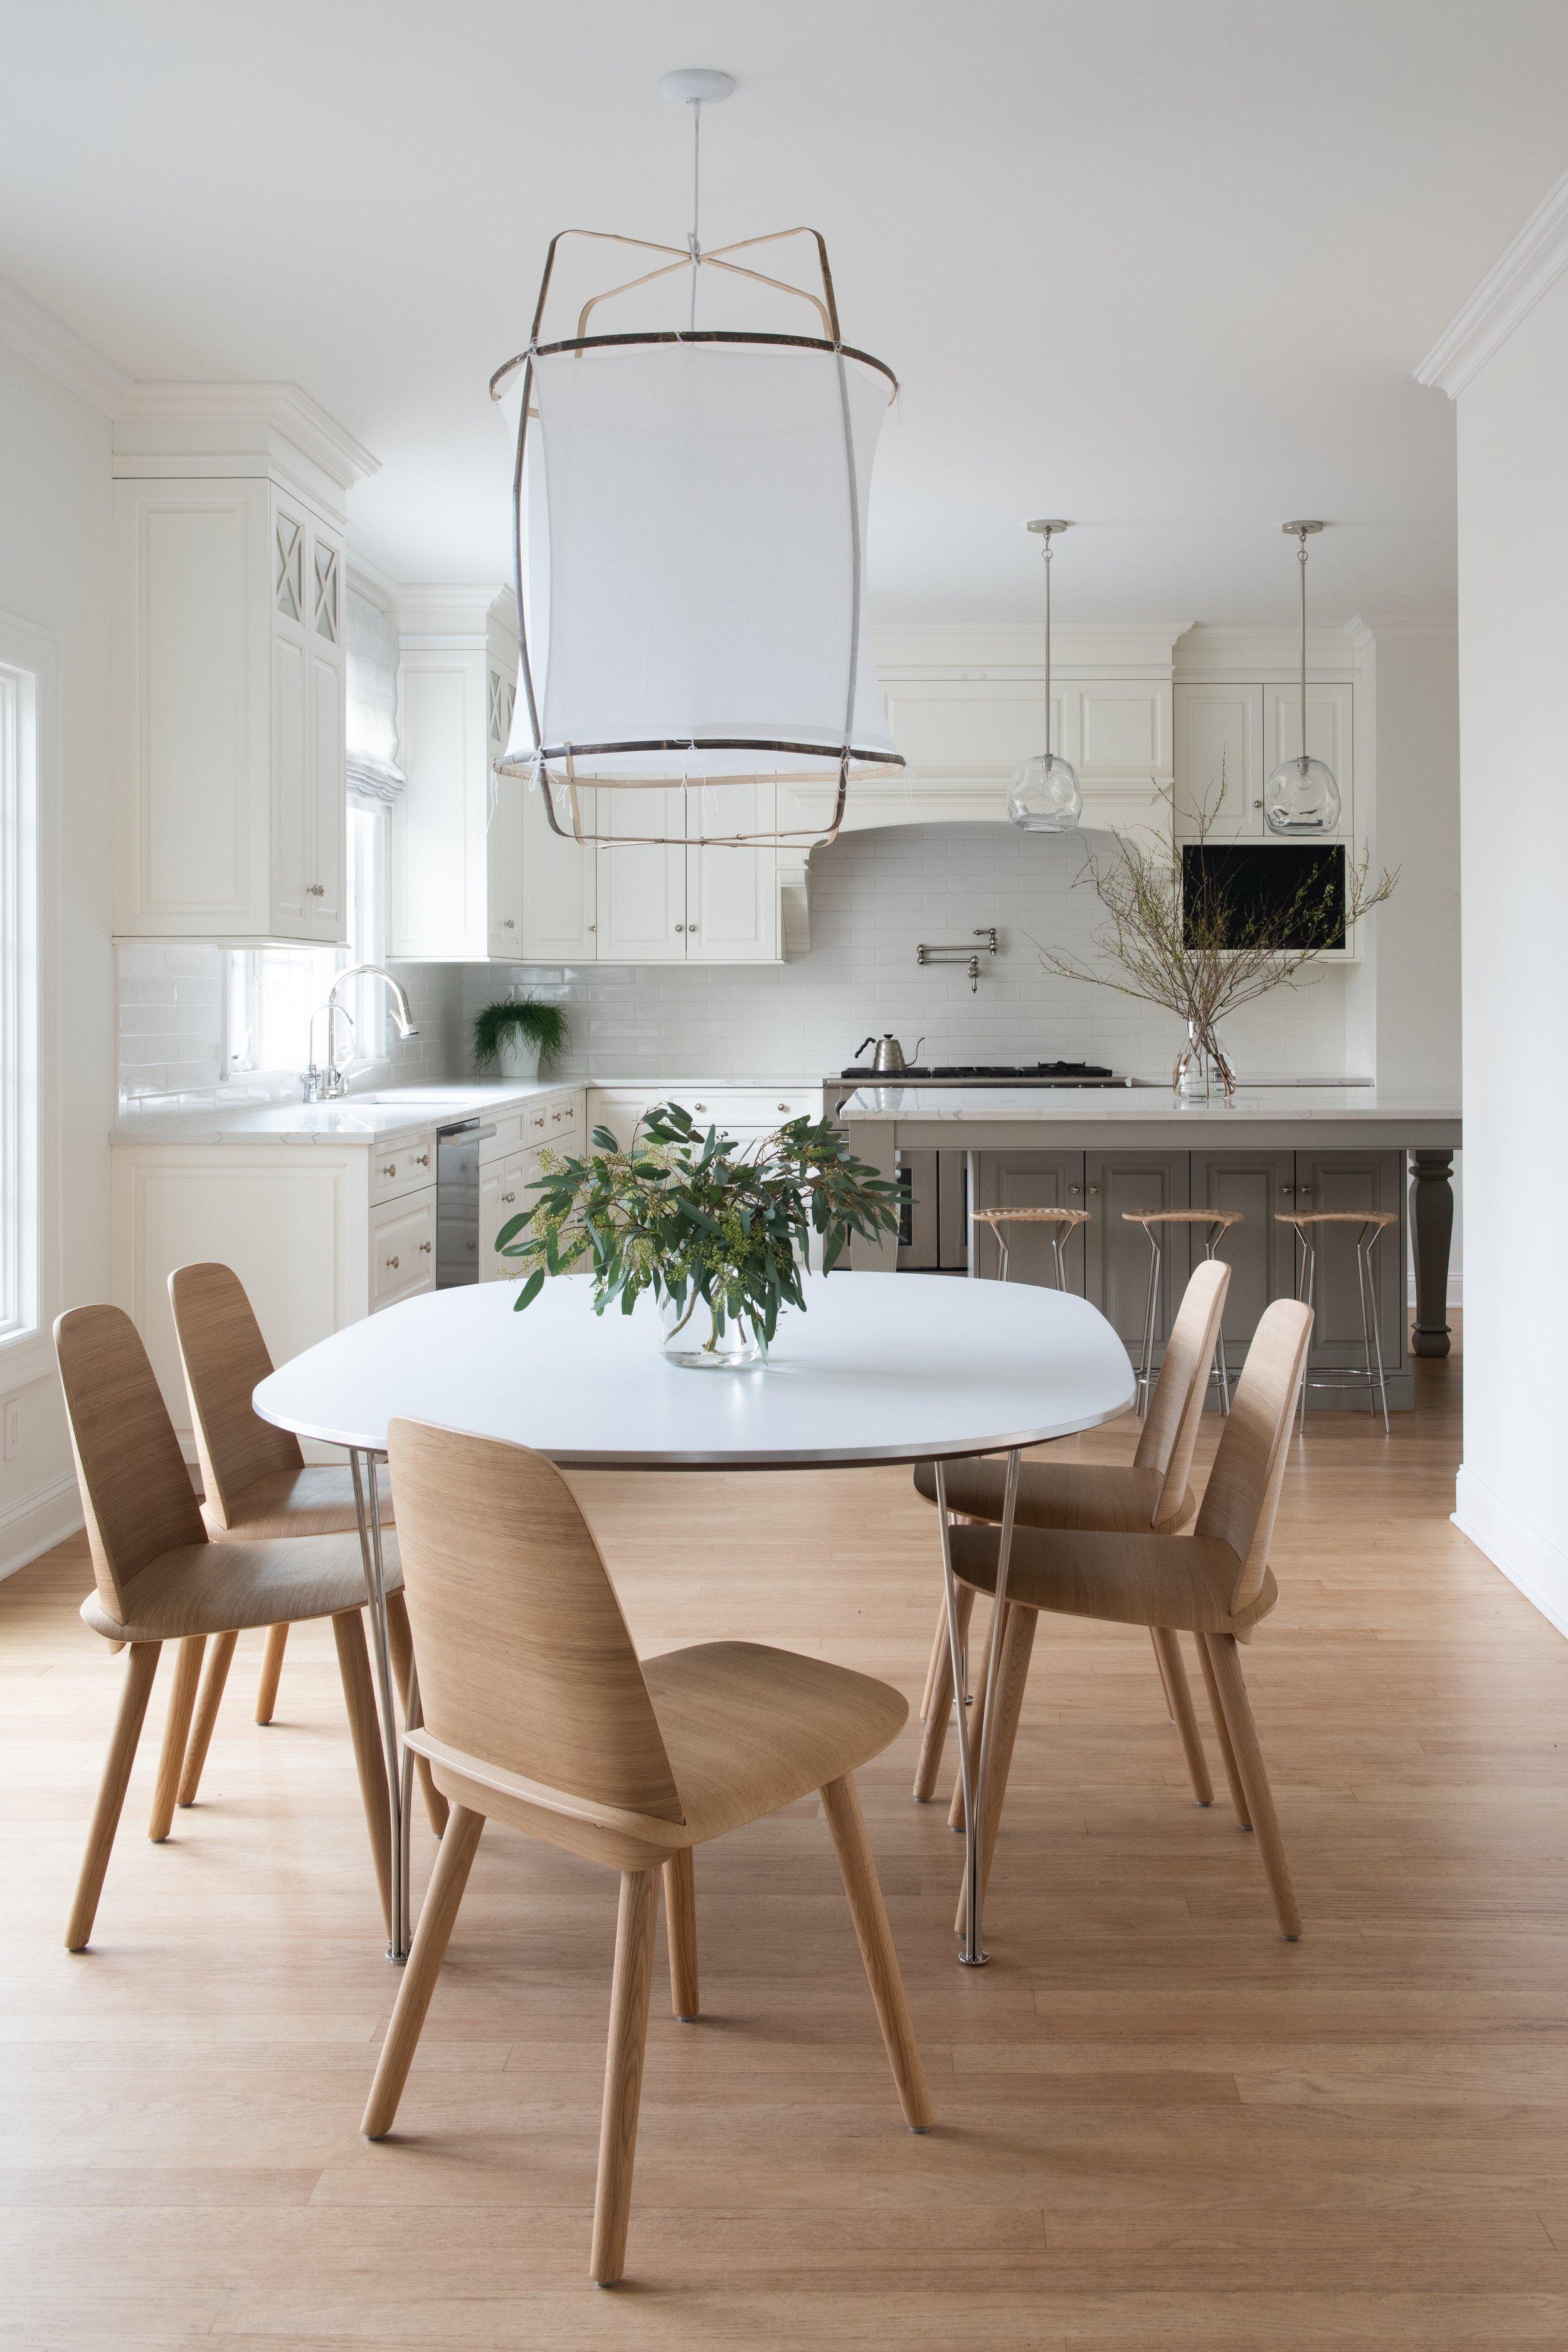 LAVA-interiors-Manor-Road-Ridgewood-New-Jersey-Home-House-Interior-Design-Renovation-Kitchen.jpg